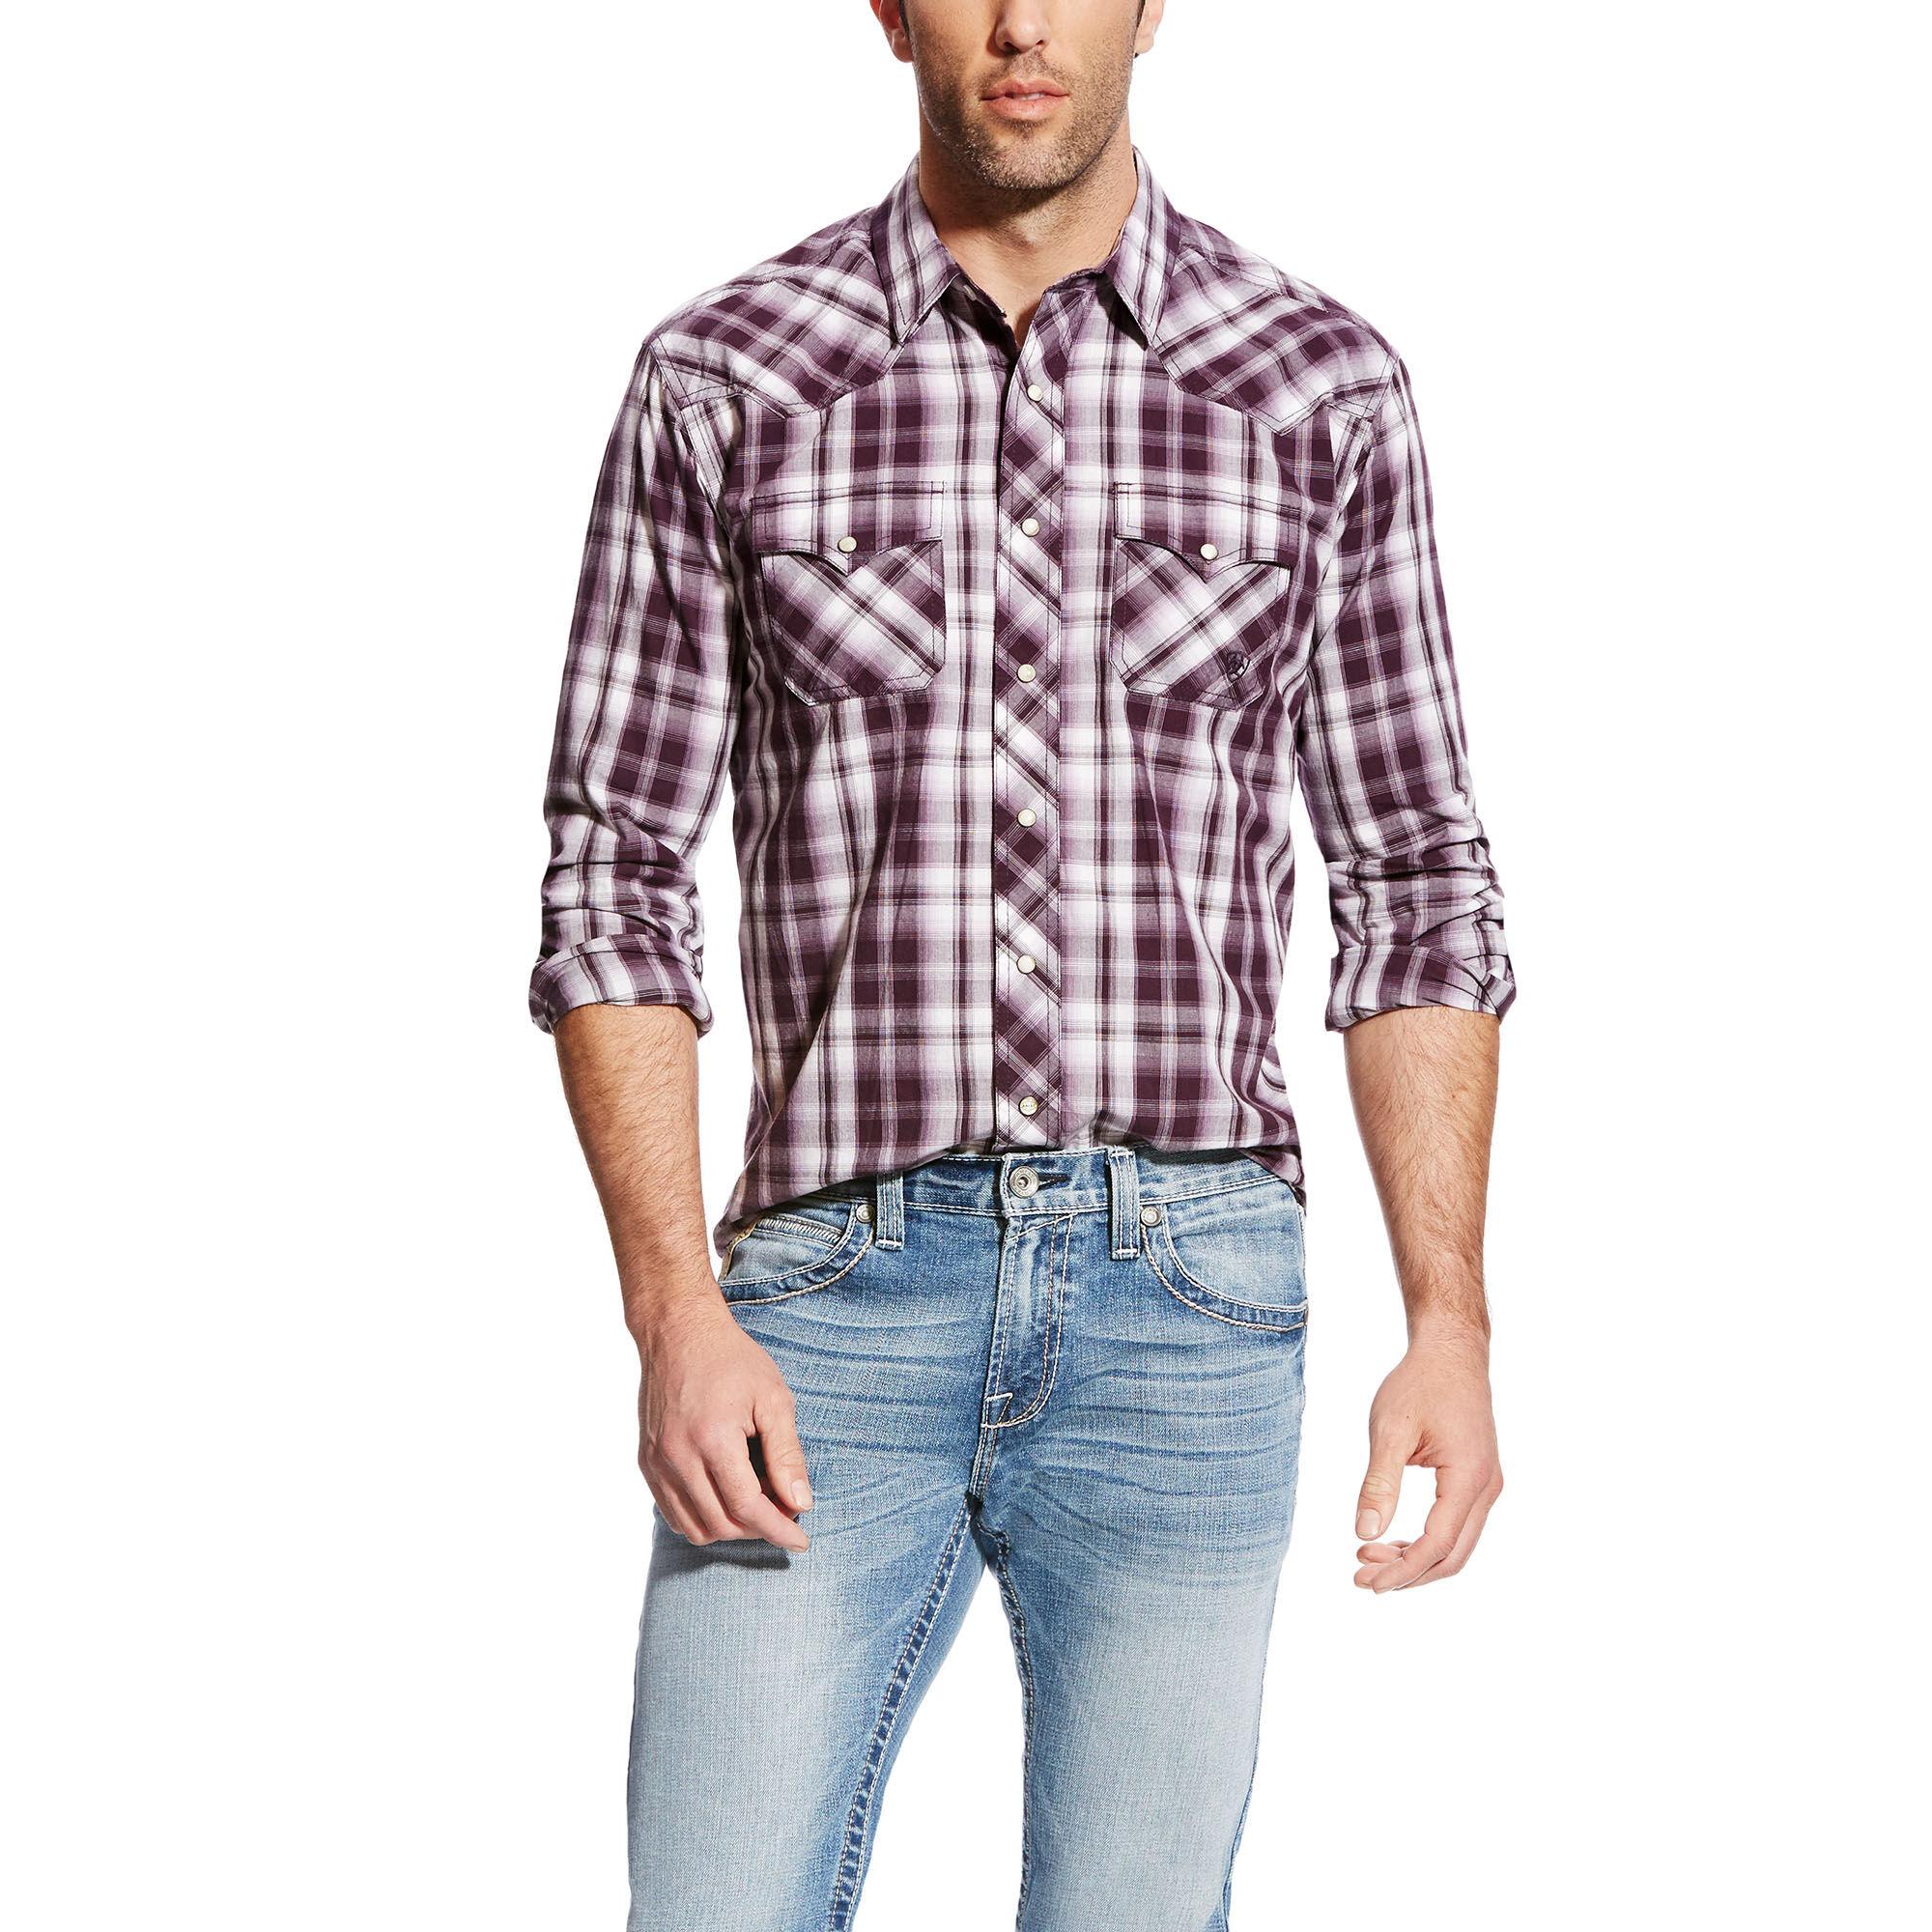 Hunter Snap Retro Shirt